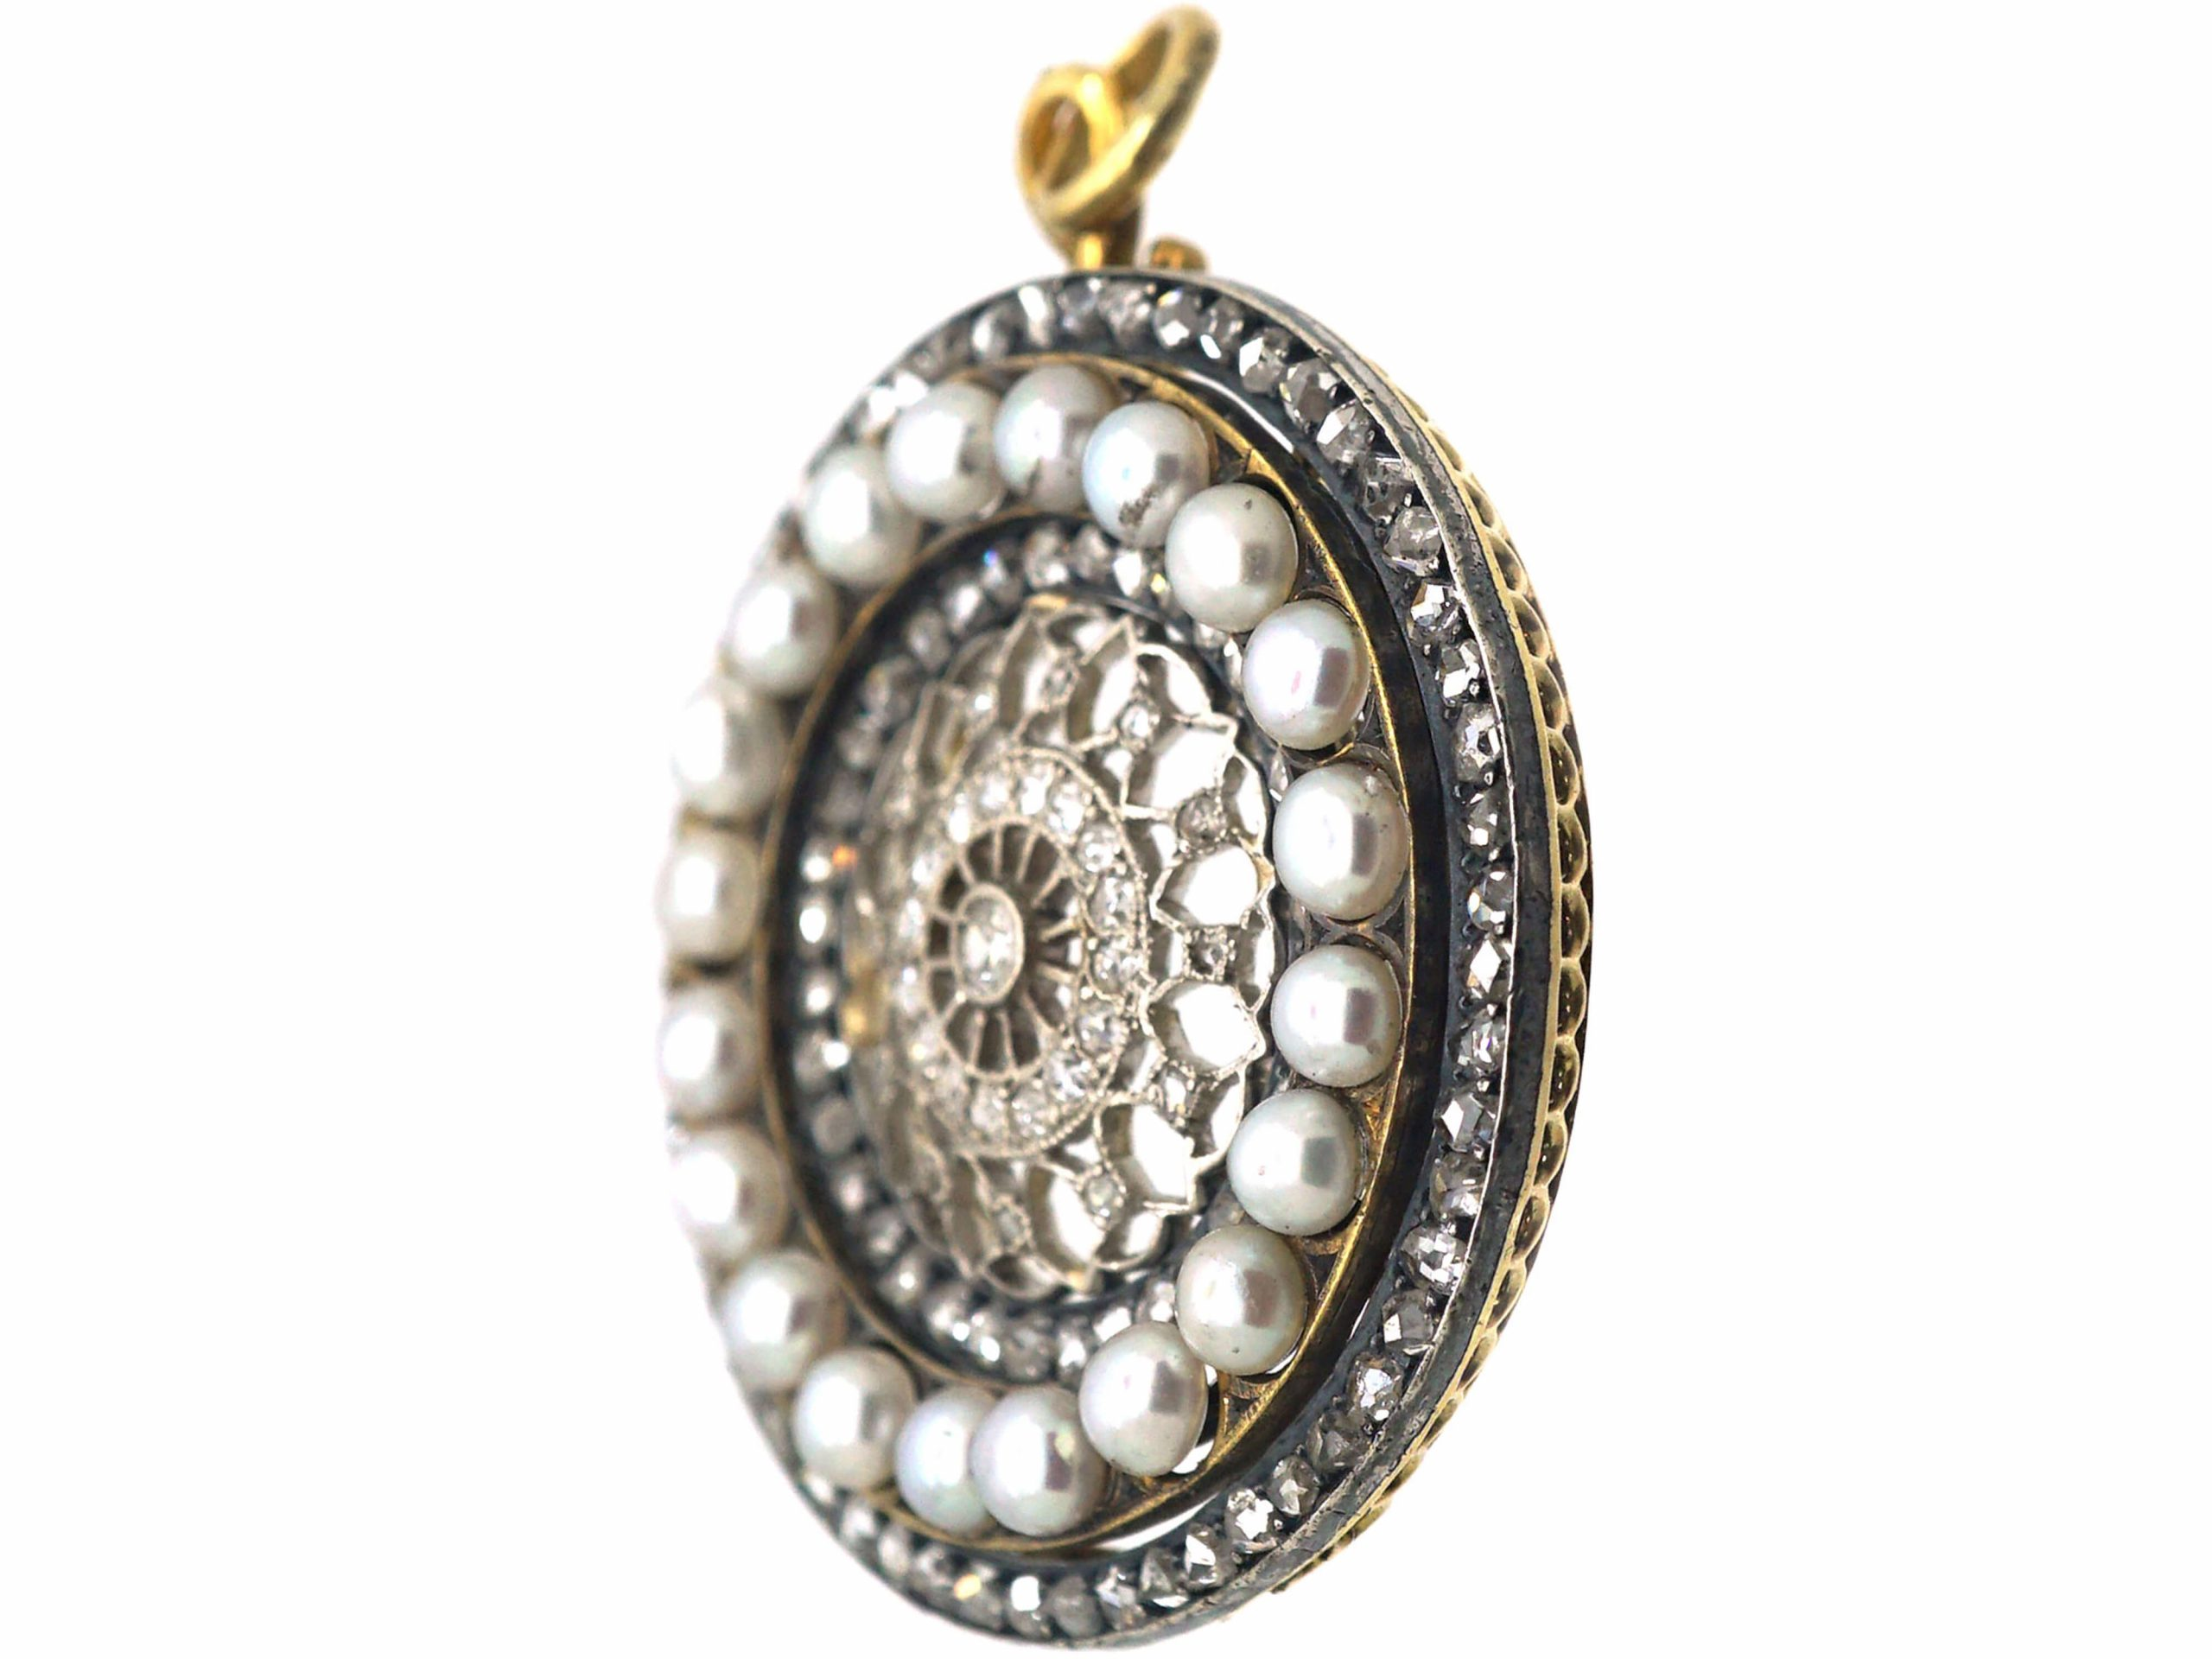 Edwardian Gold & Silver, Rose Diamond & Pearls Round Pendant